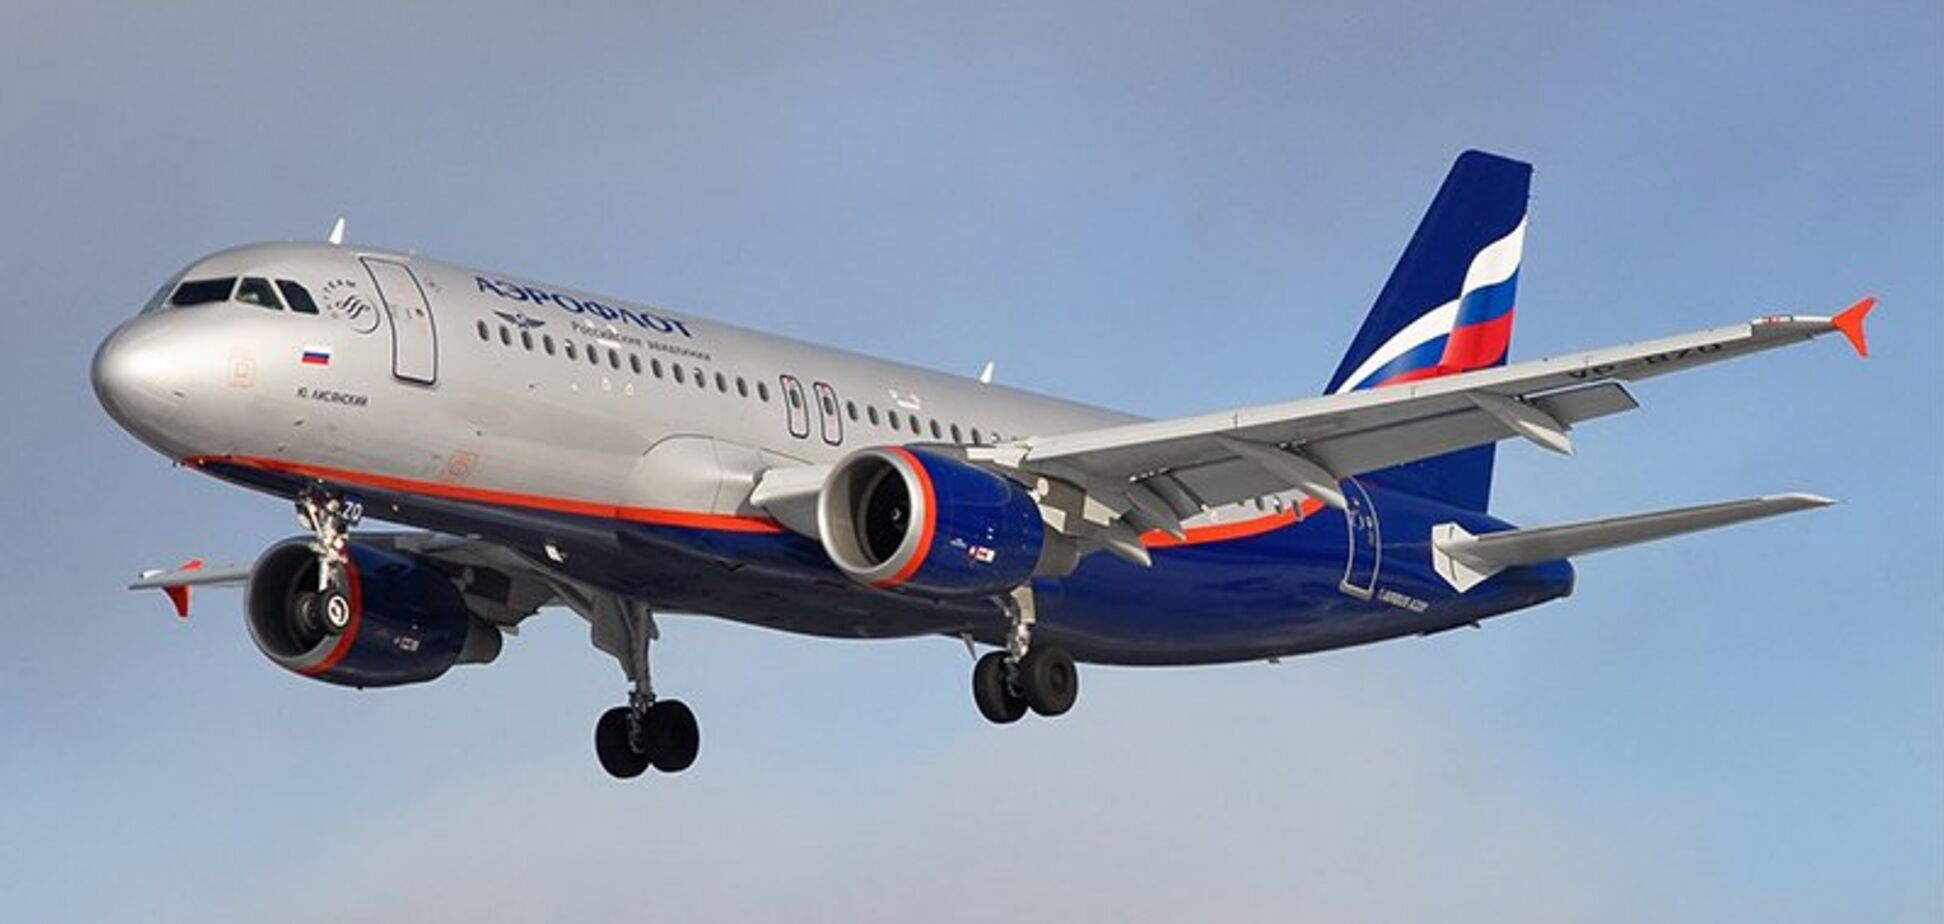 У Росії літак із пасажирами зламався у небі: всі деталі НП